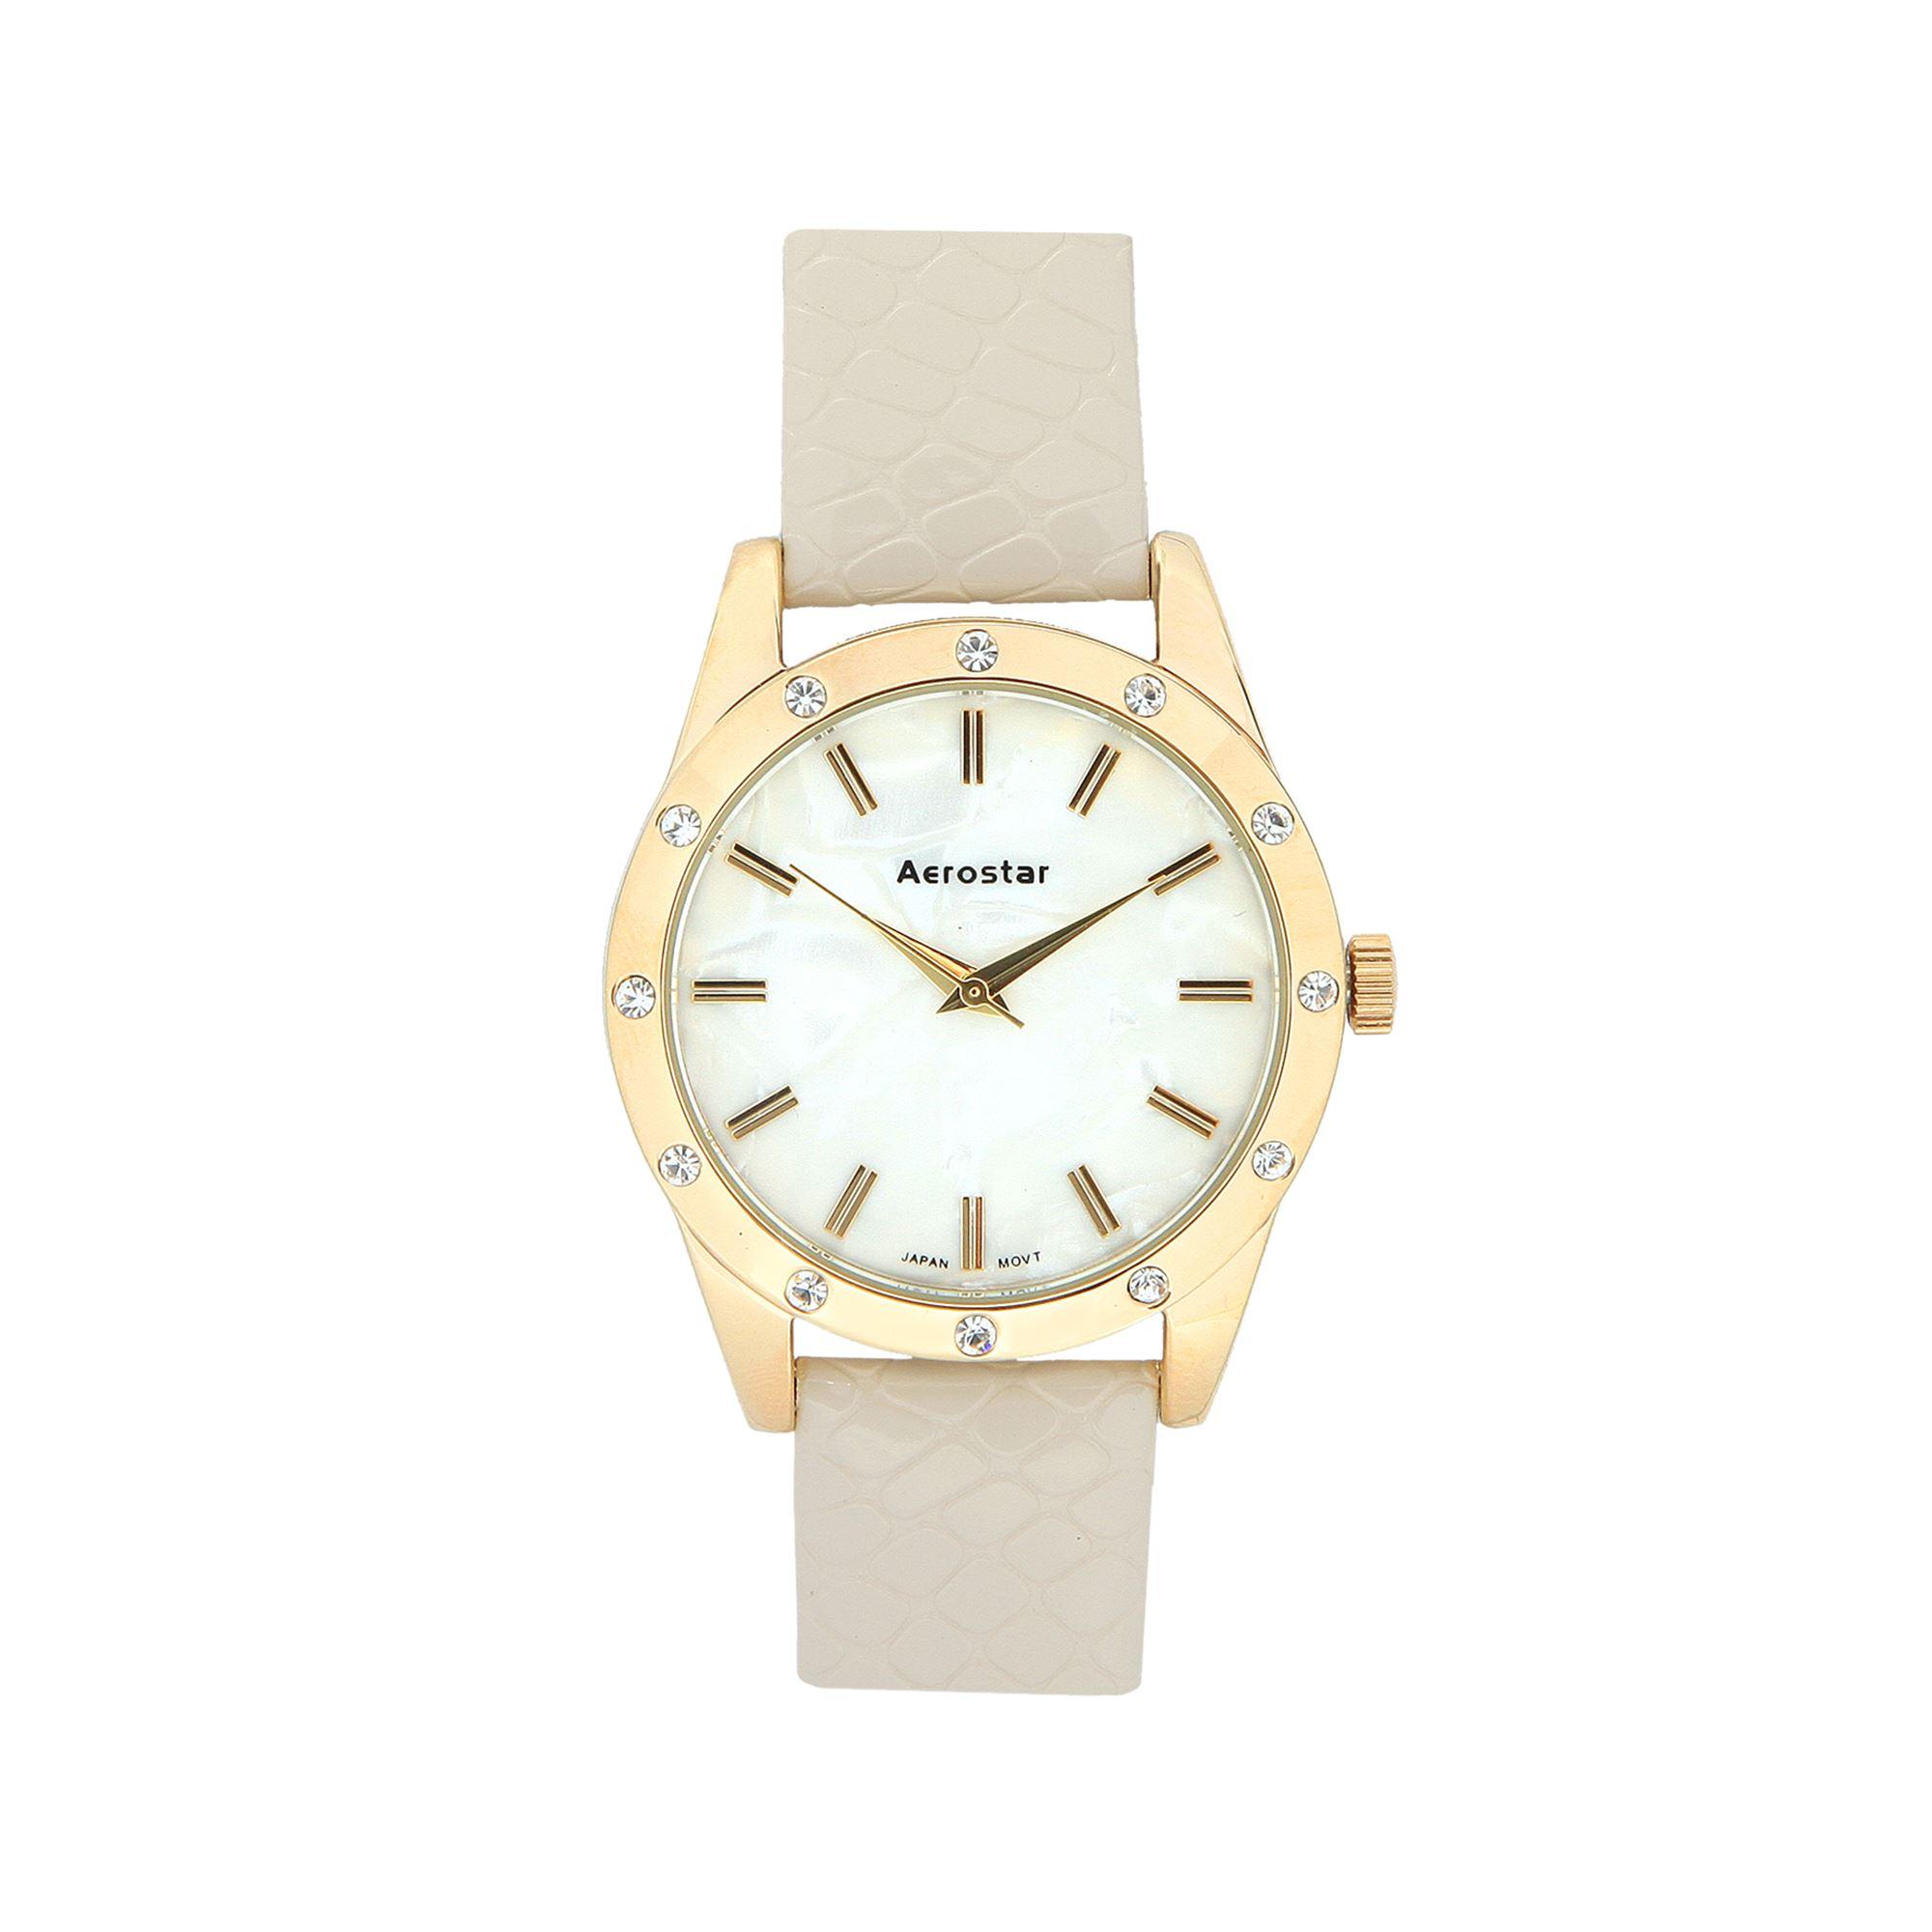 Aerostar - Reloj Dama 63123 Beige  ed0949373e5d